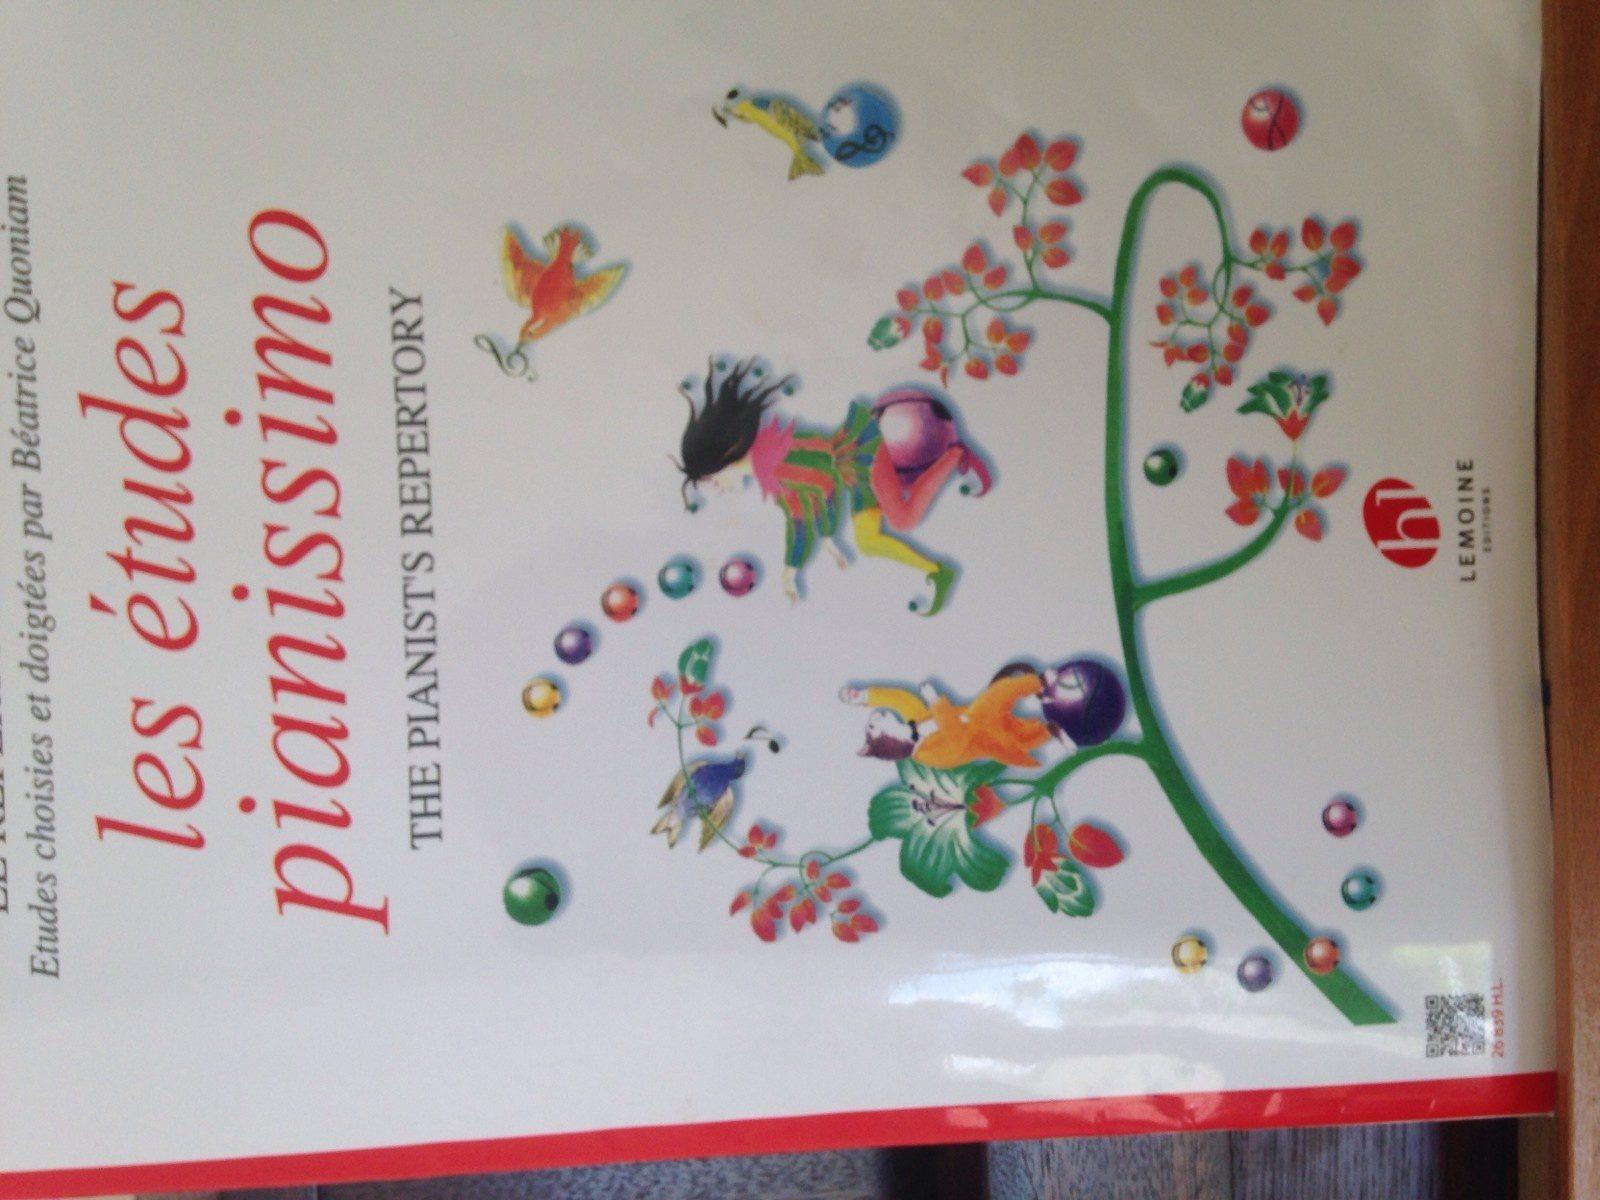 les etudes pianissimo - Ingredients - fr